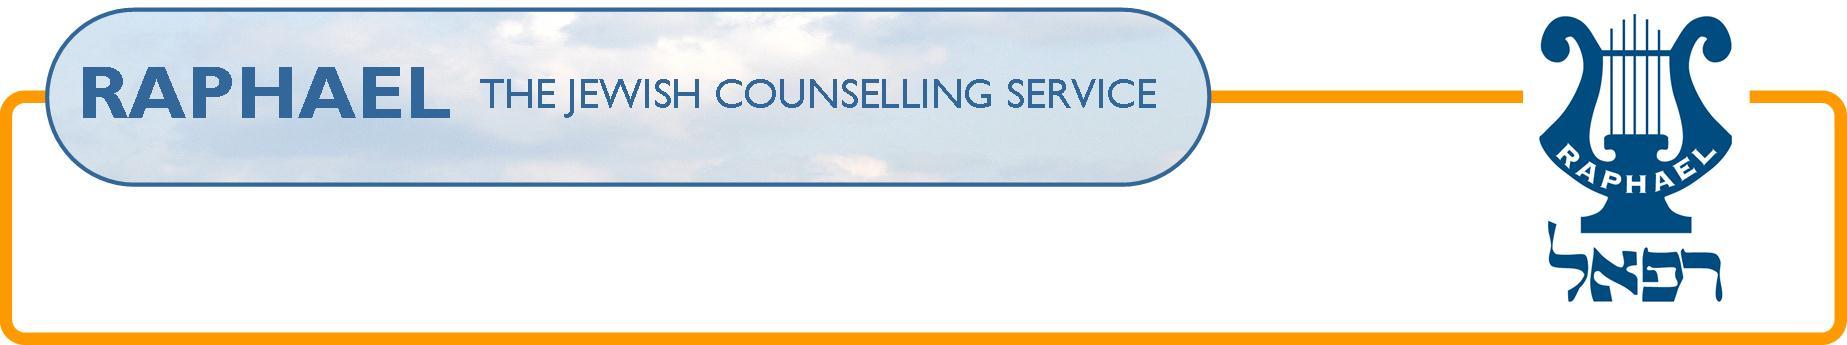 Raphael Jewish Counselling Service